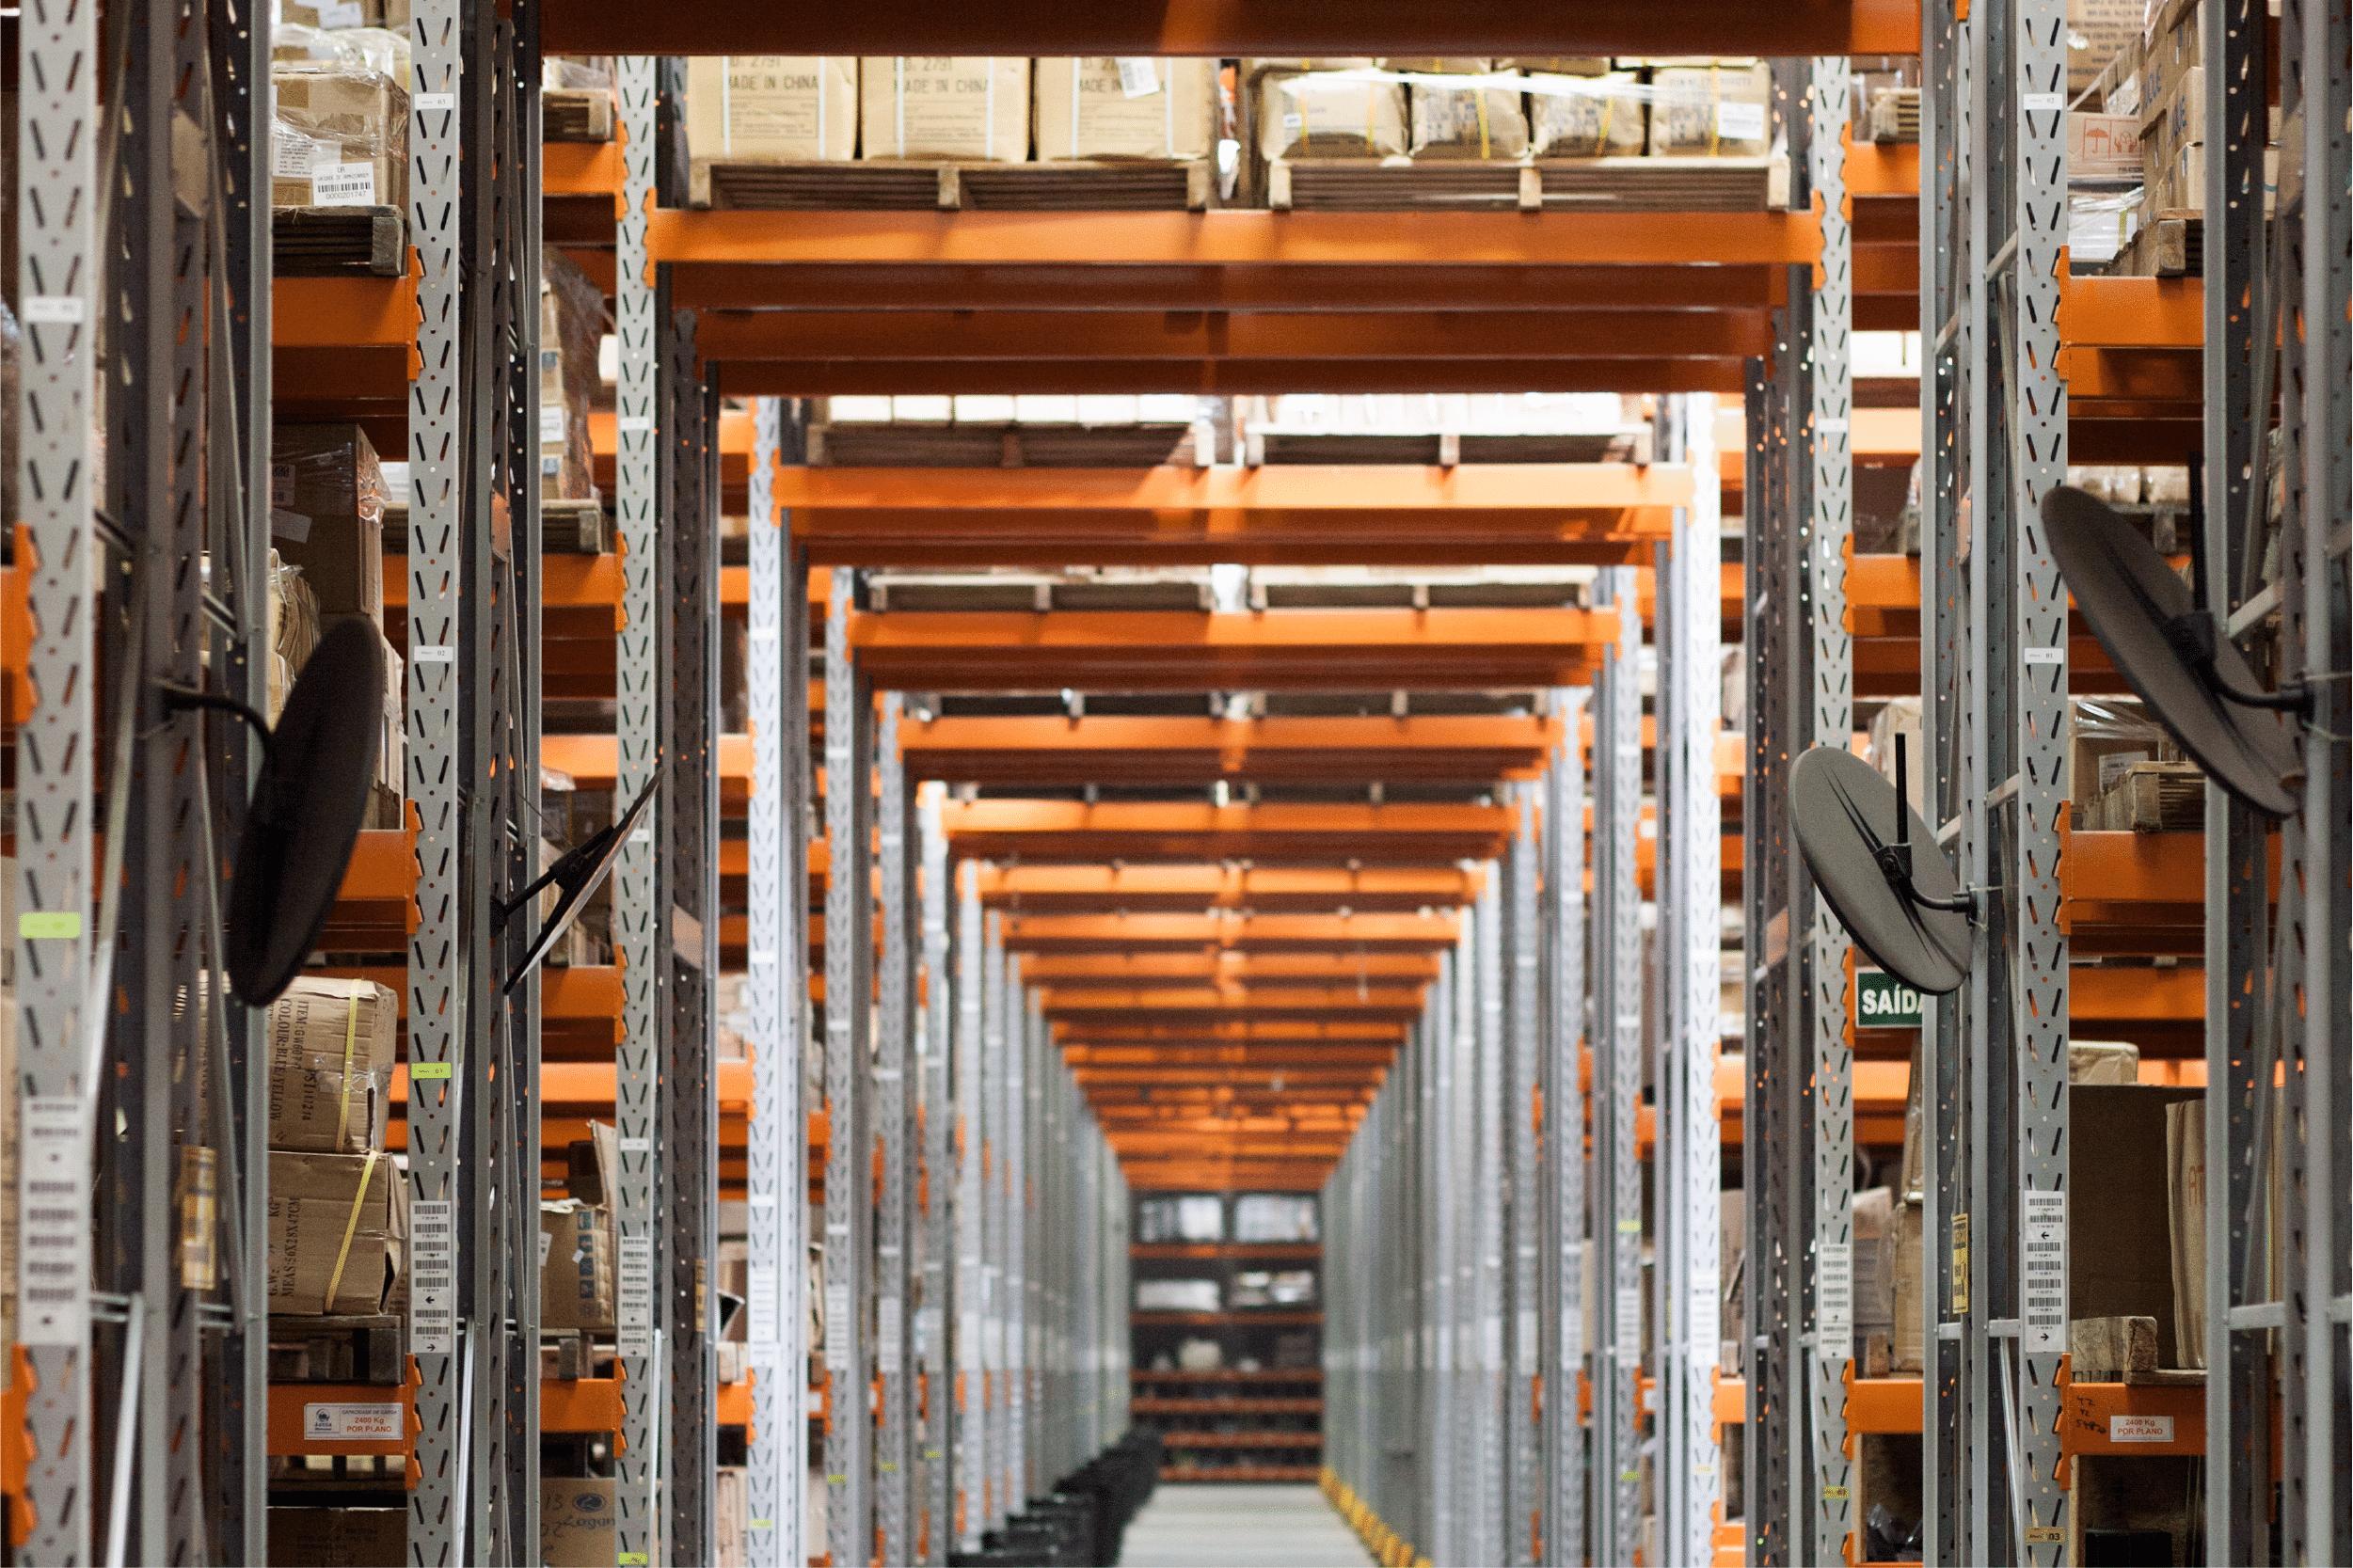 Isle of warehouse